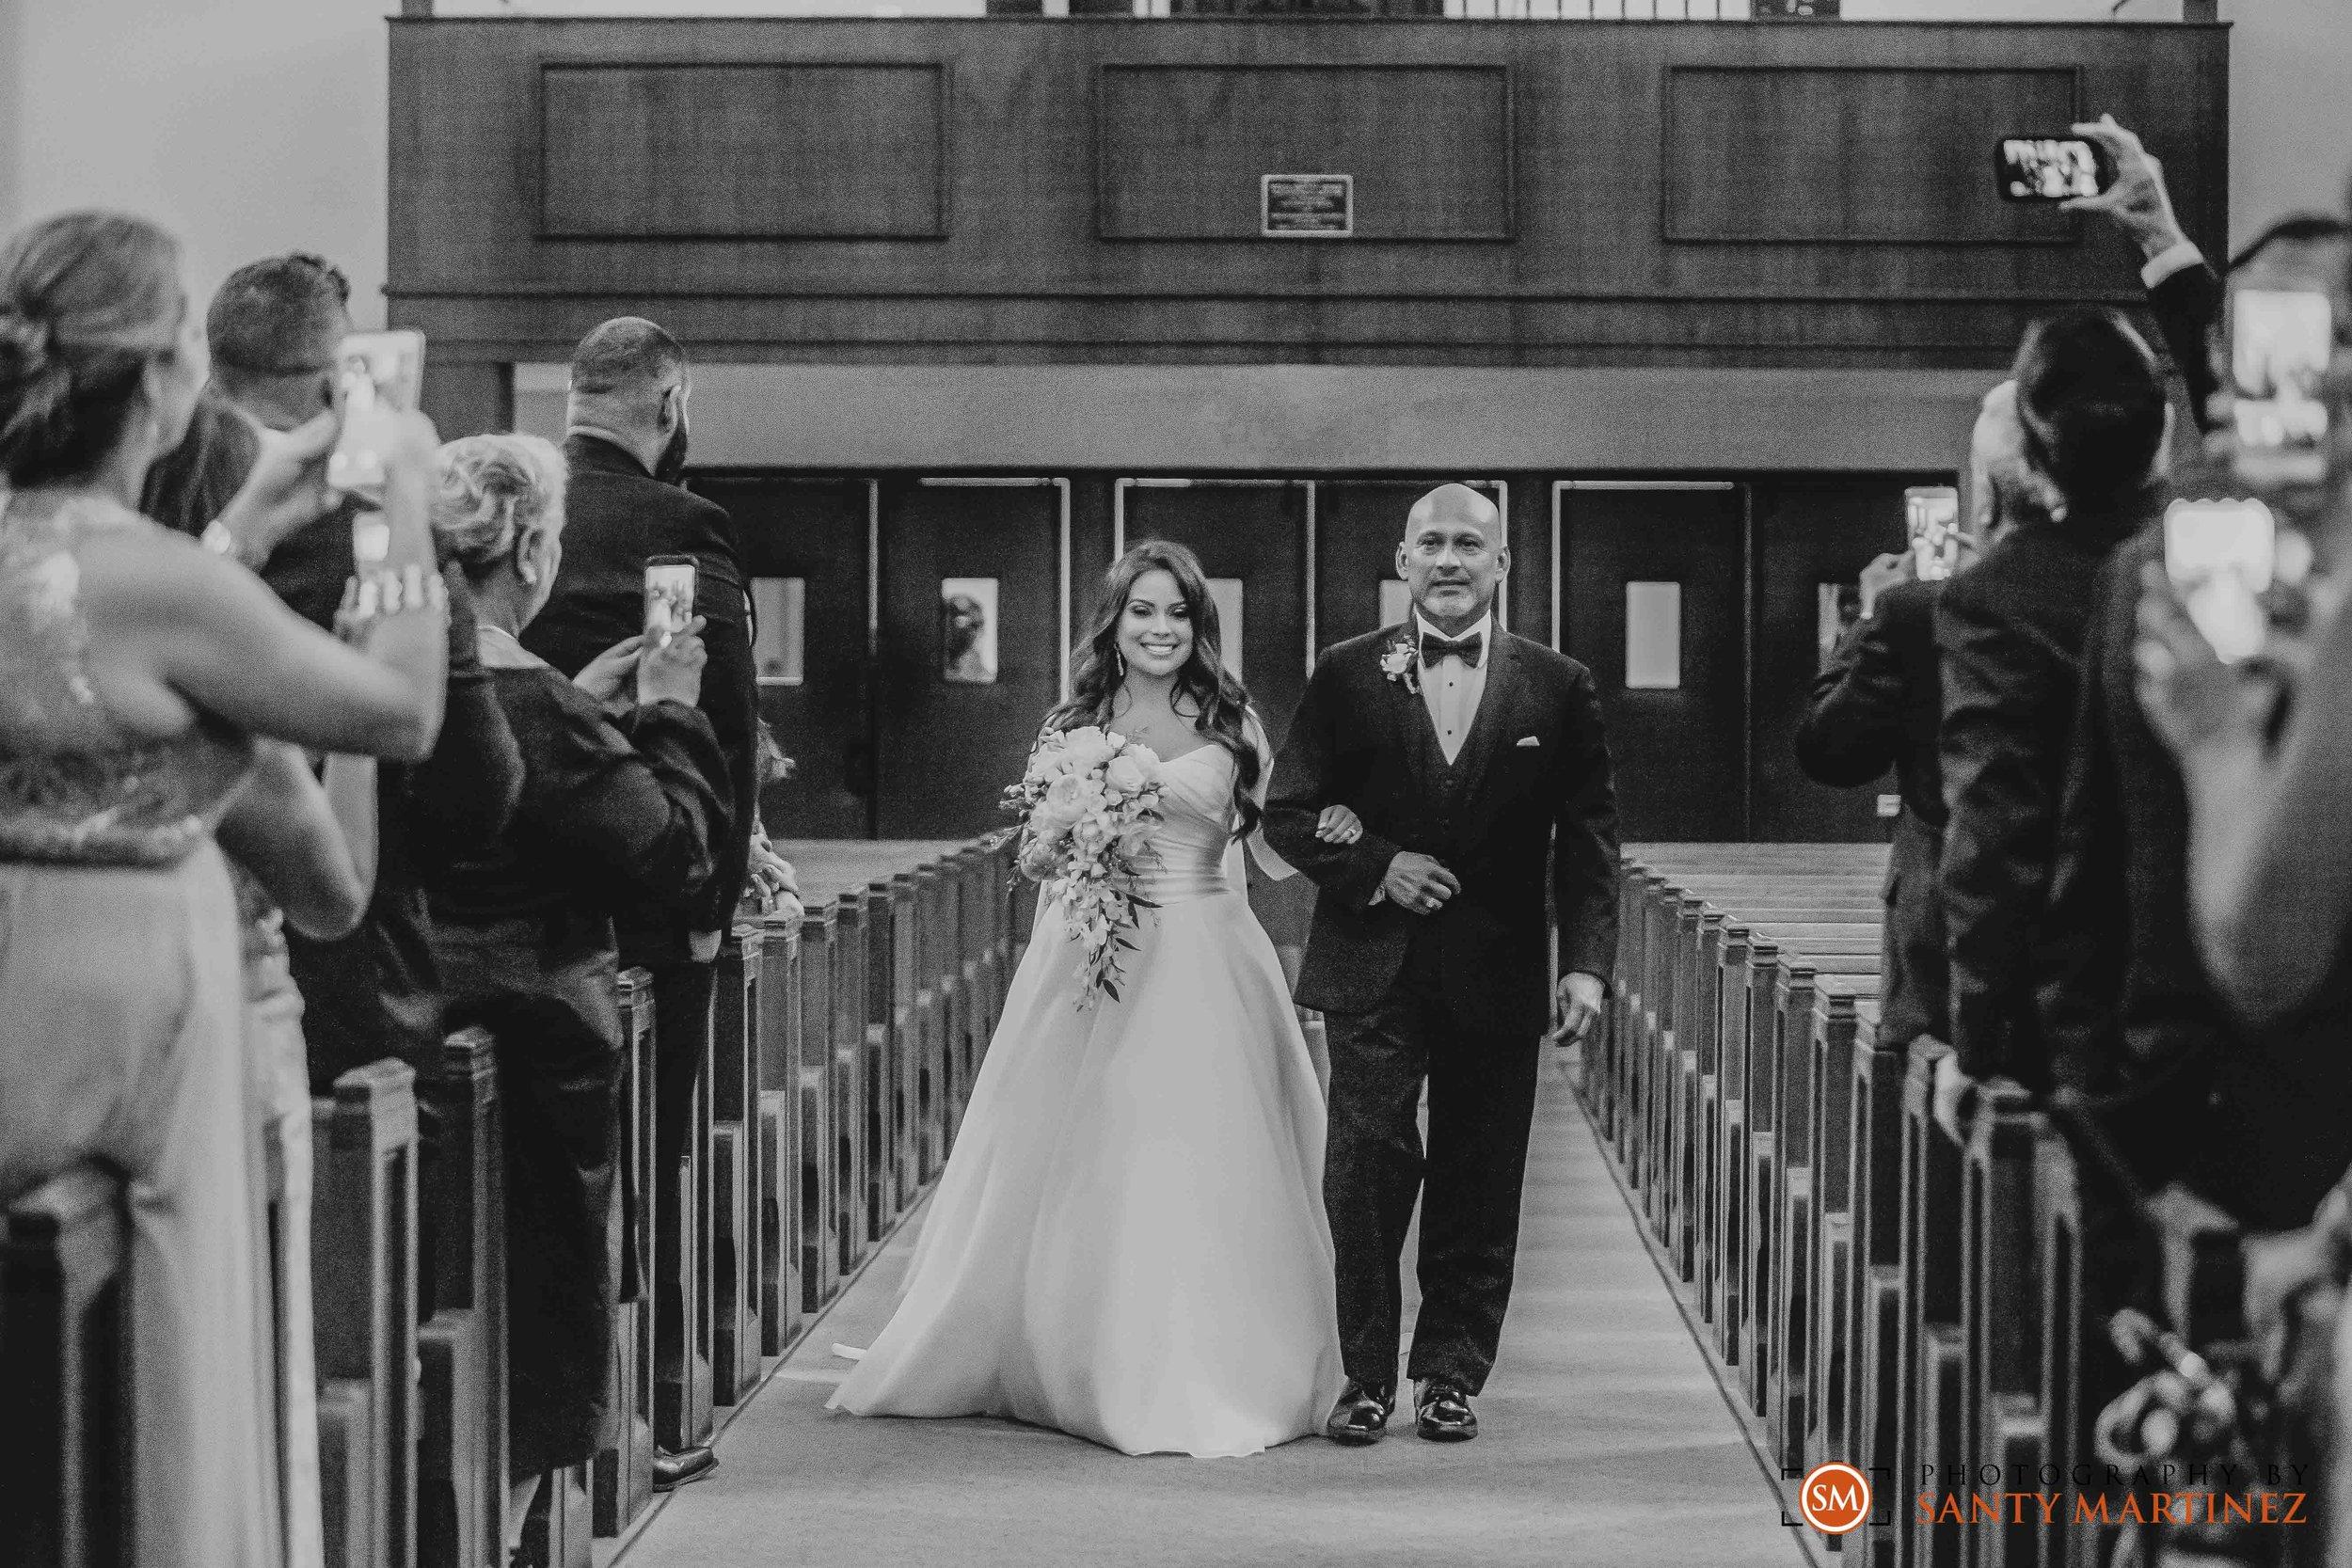 Wedding First Miami Presbyterian Church - Photography by Santy Martinez-19.jpg